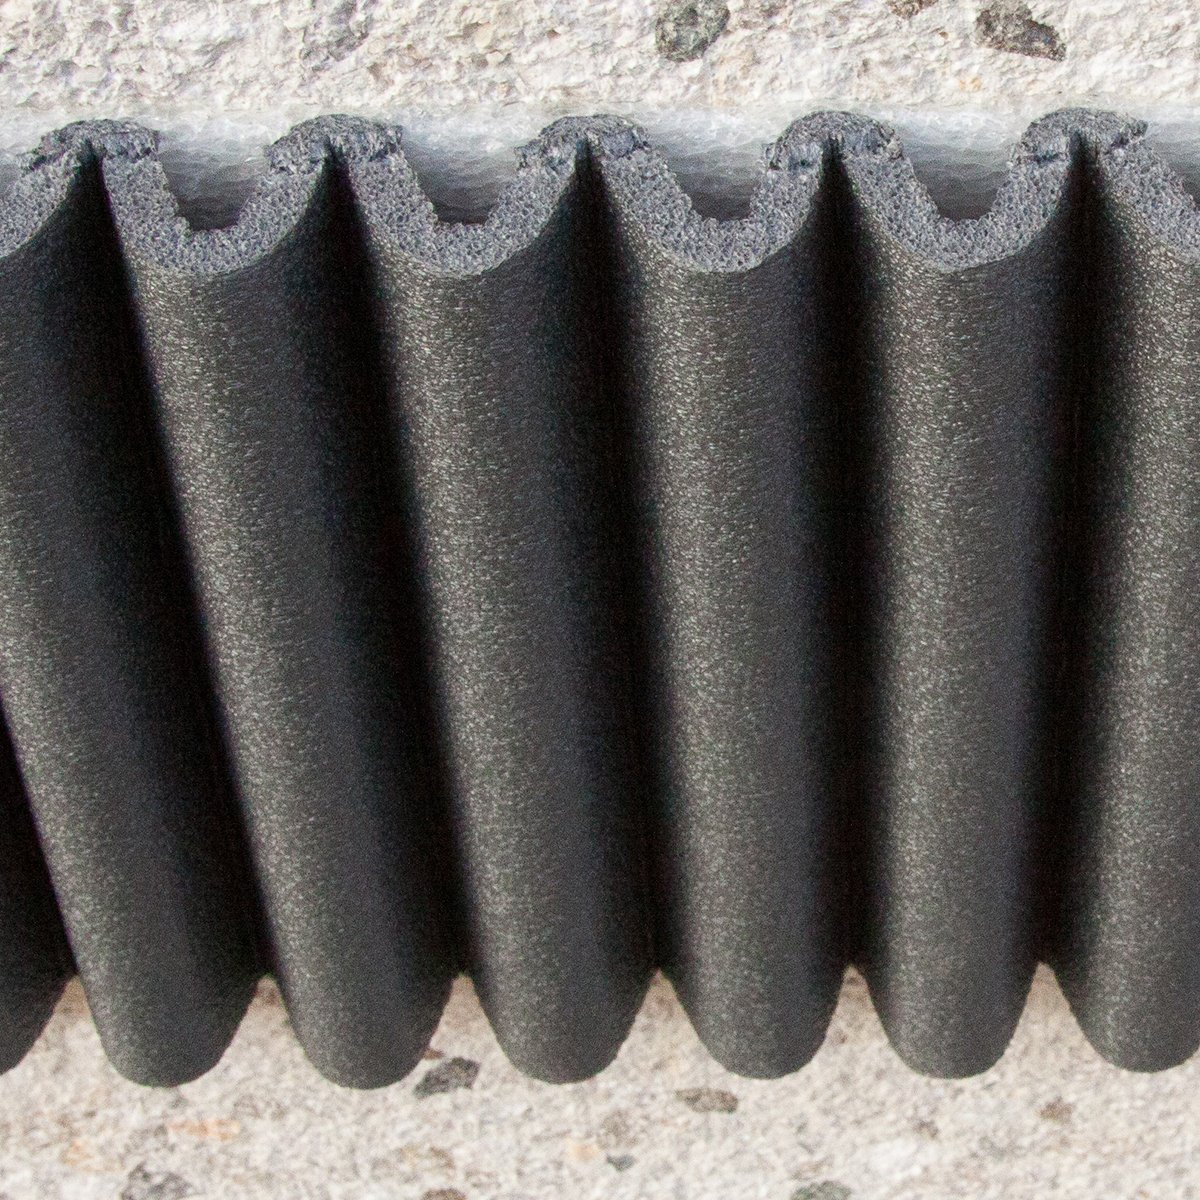 Mondaplen wall bumpers self adhesive protective foam strips car mondaplen wall bumpers self adhesive protective foam strips car door protectors for garage walls each set consists of 2 strips 135 m x 17 cm rubansaba